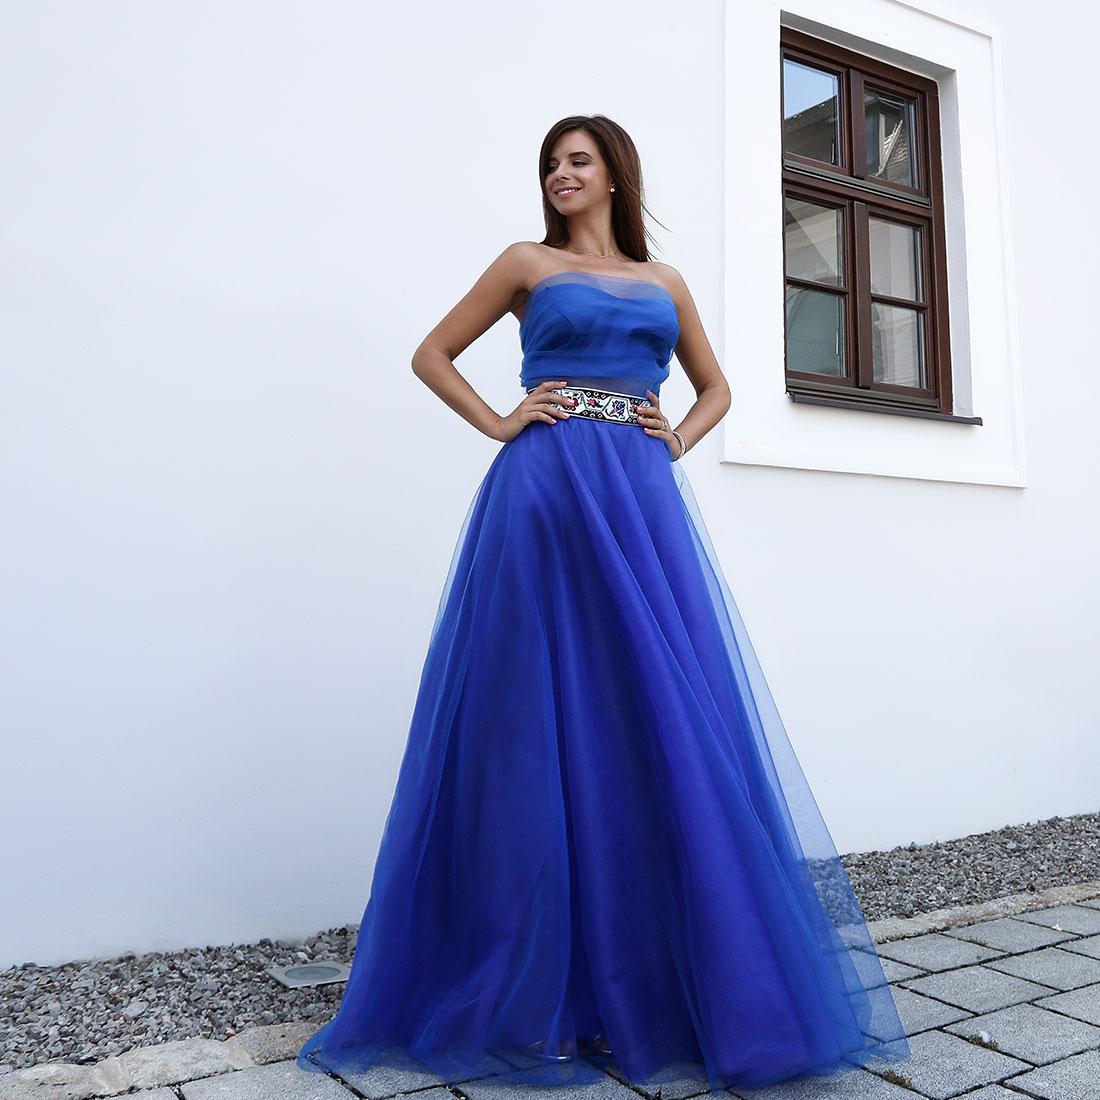 34758e764 Katleen - Spoločenské a plesové šaty v Nitre